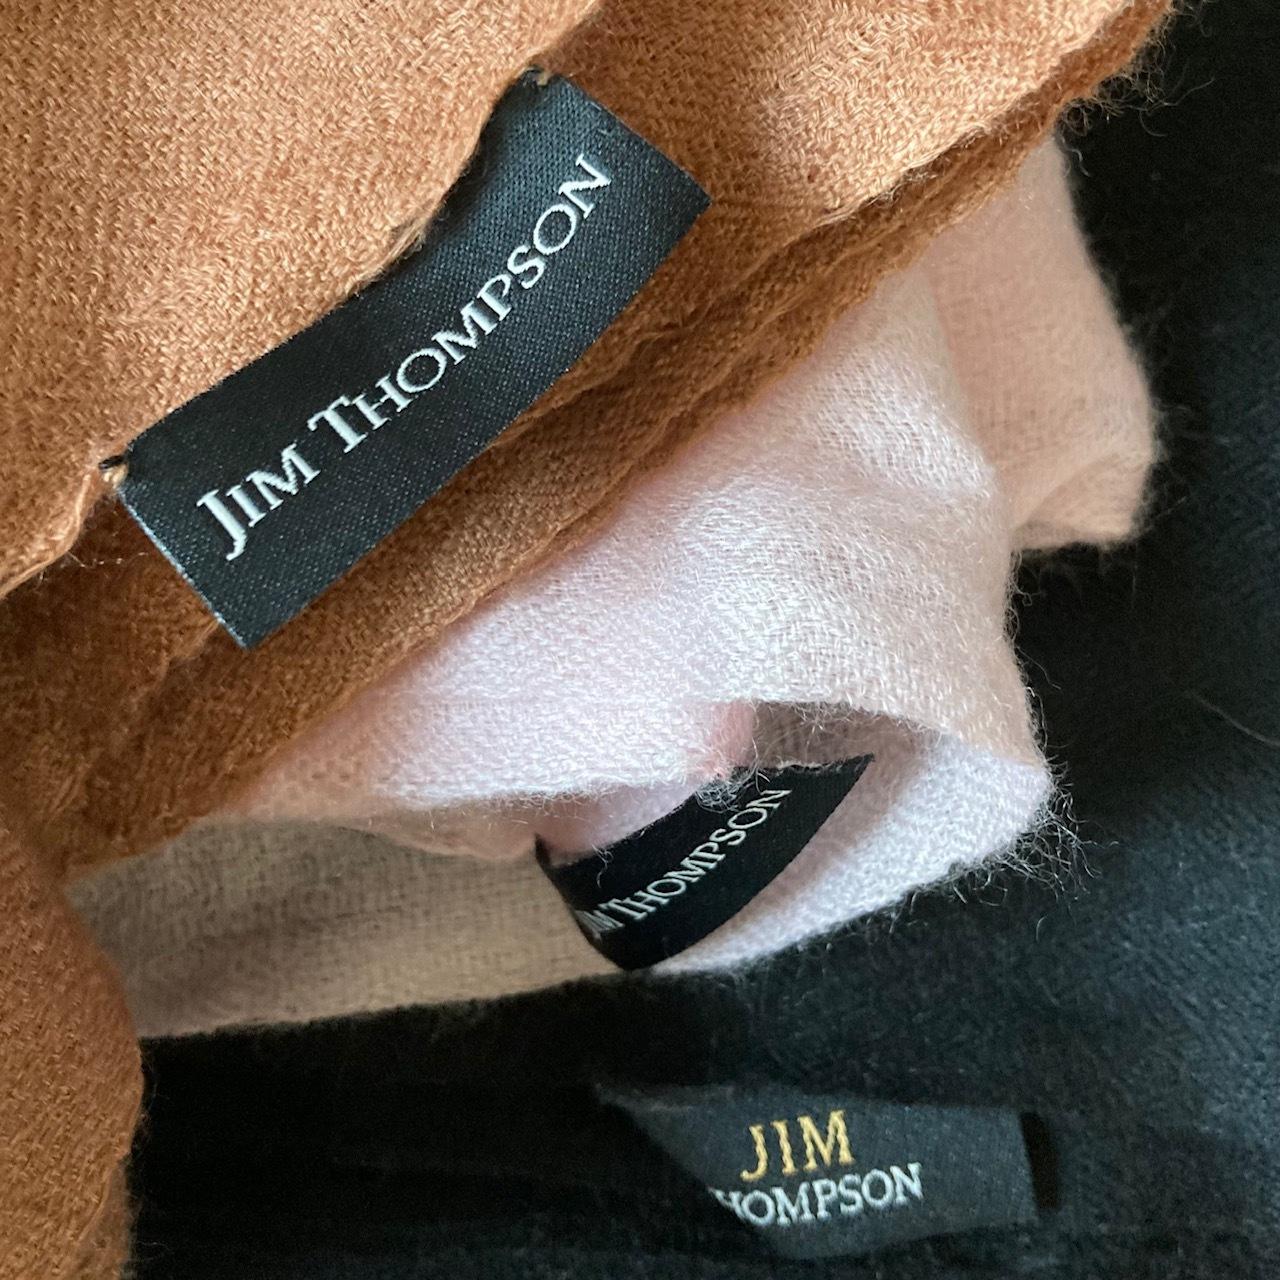 JIM THOMPSONのタグがついたストール